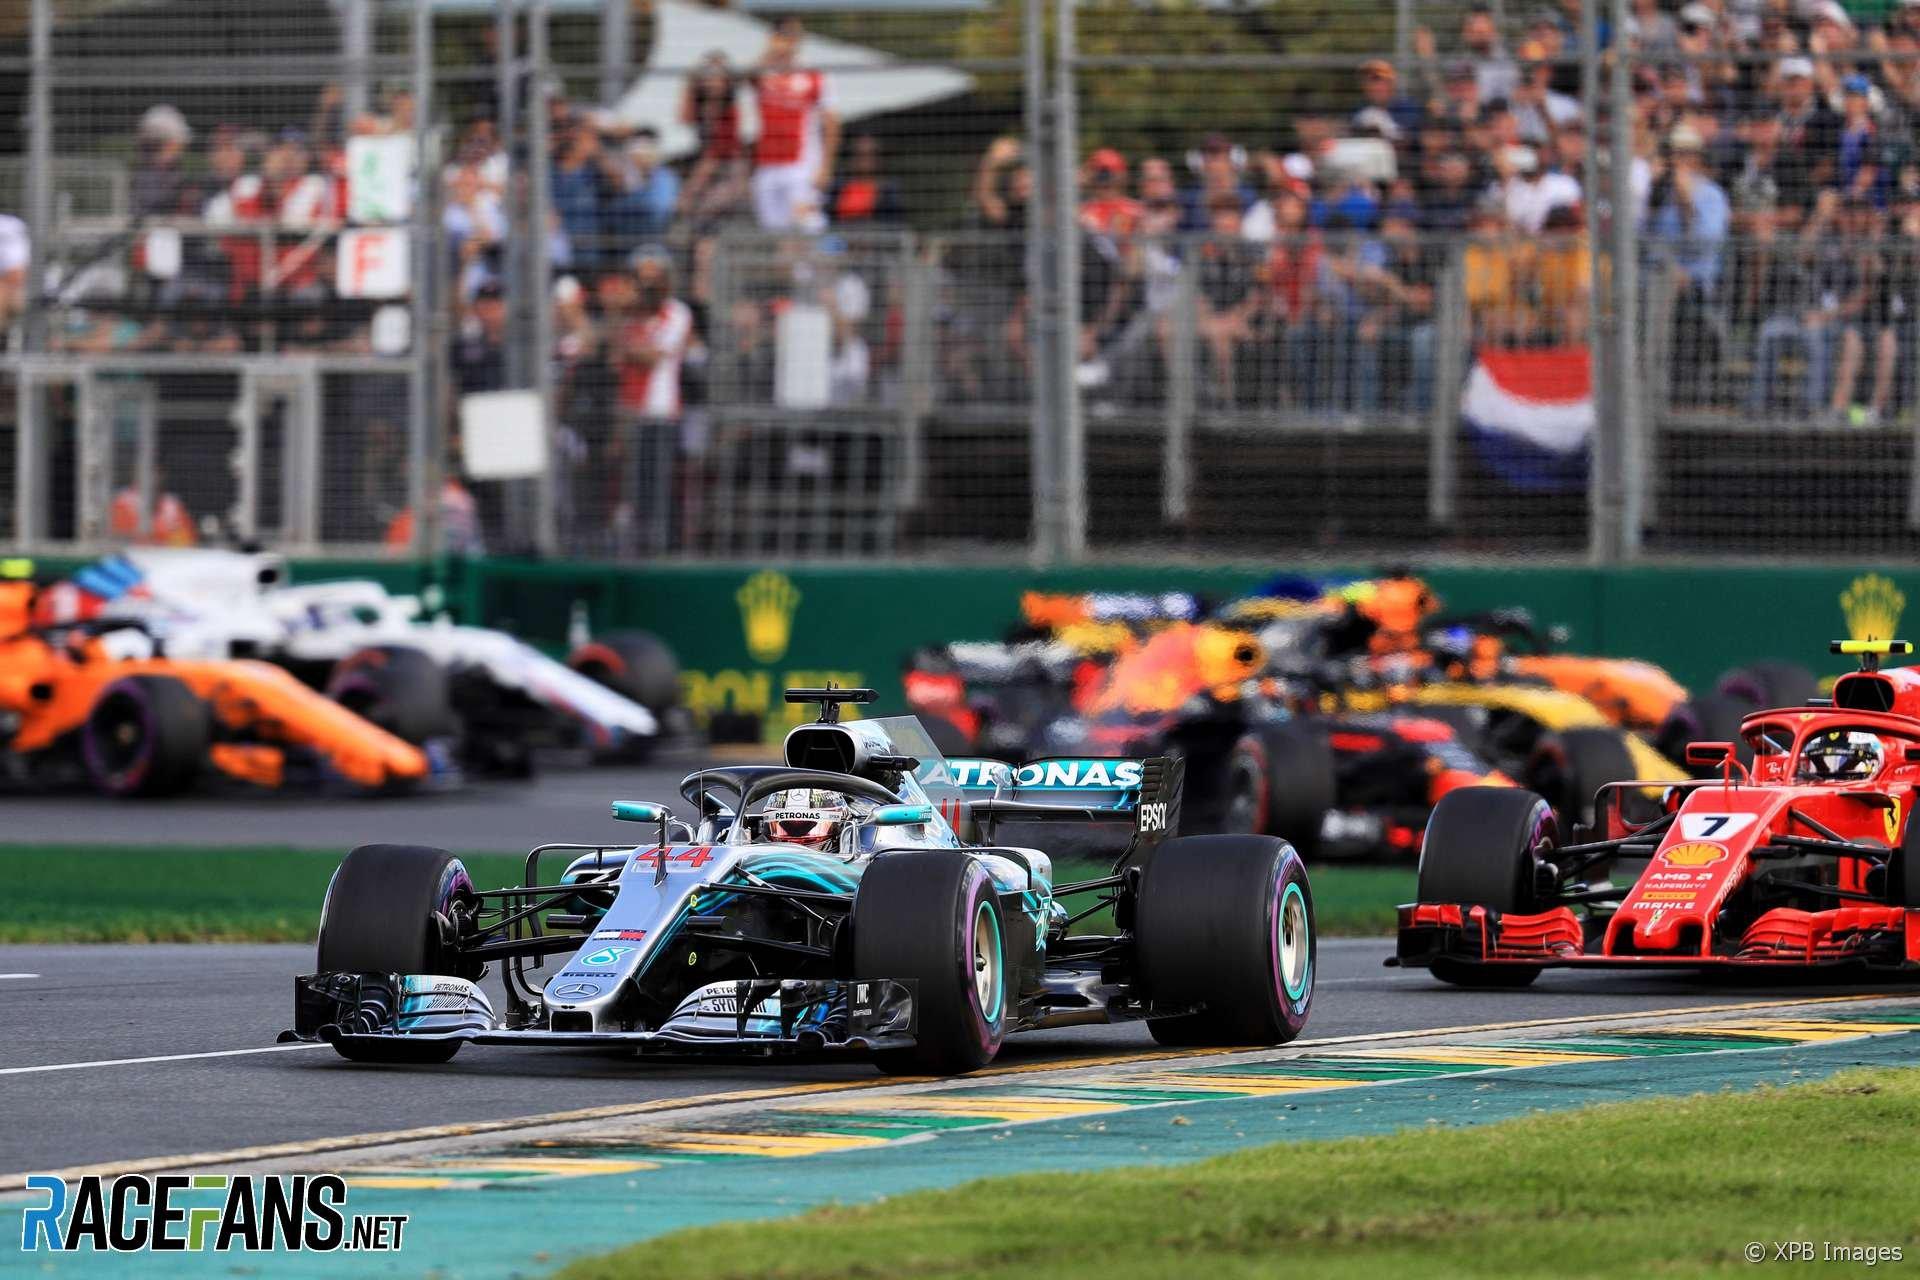 2019 Australian Grand Prix Live F1 Tv Times - Racefans F1 Calendar 2019 Channel 4